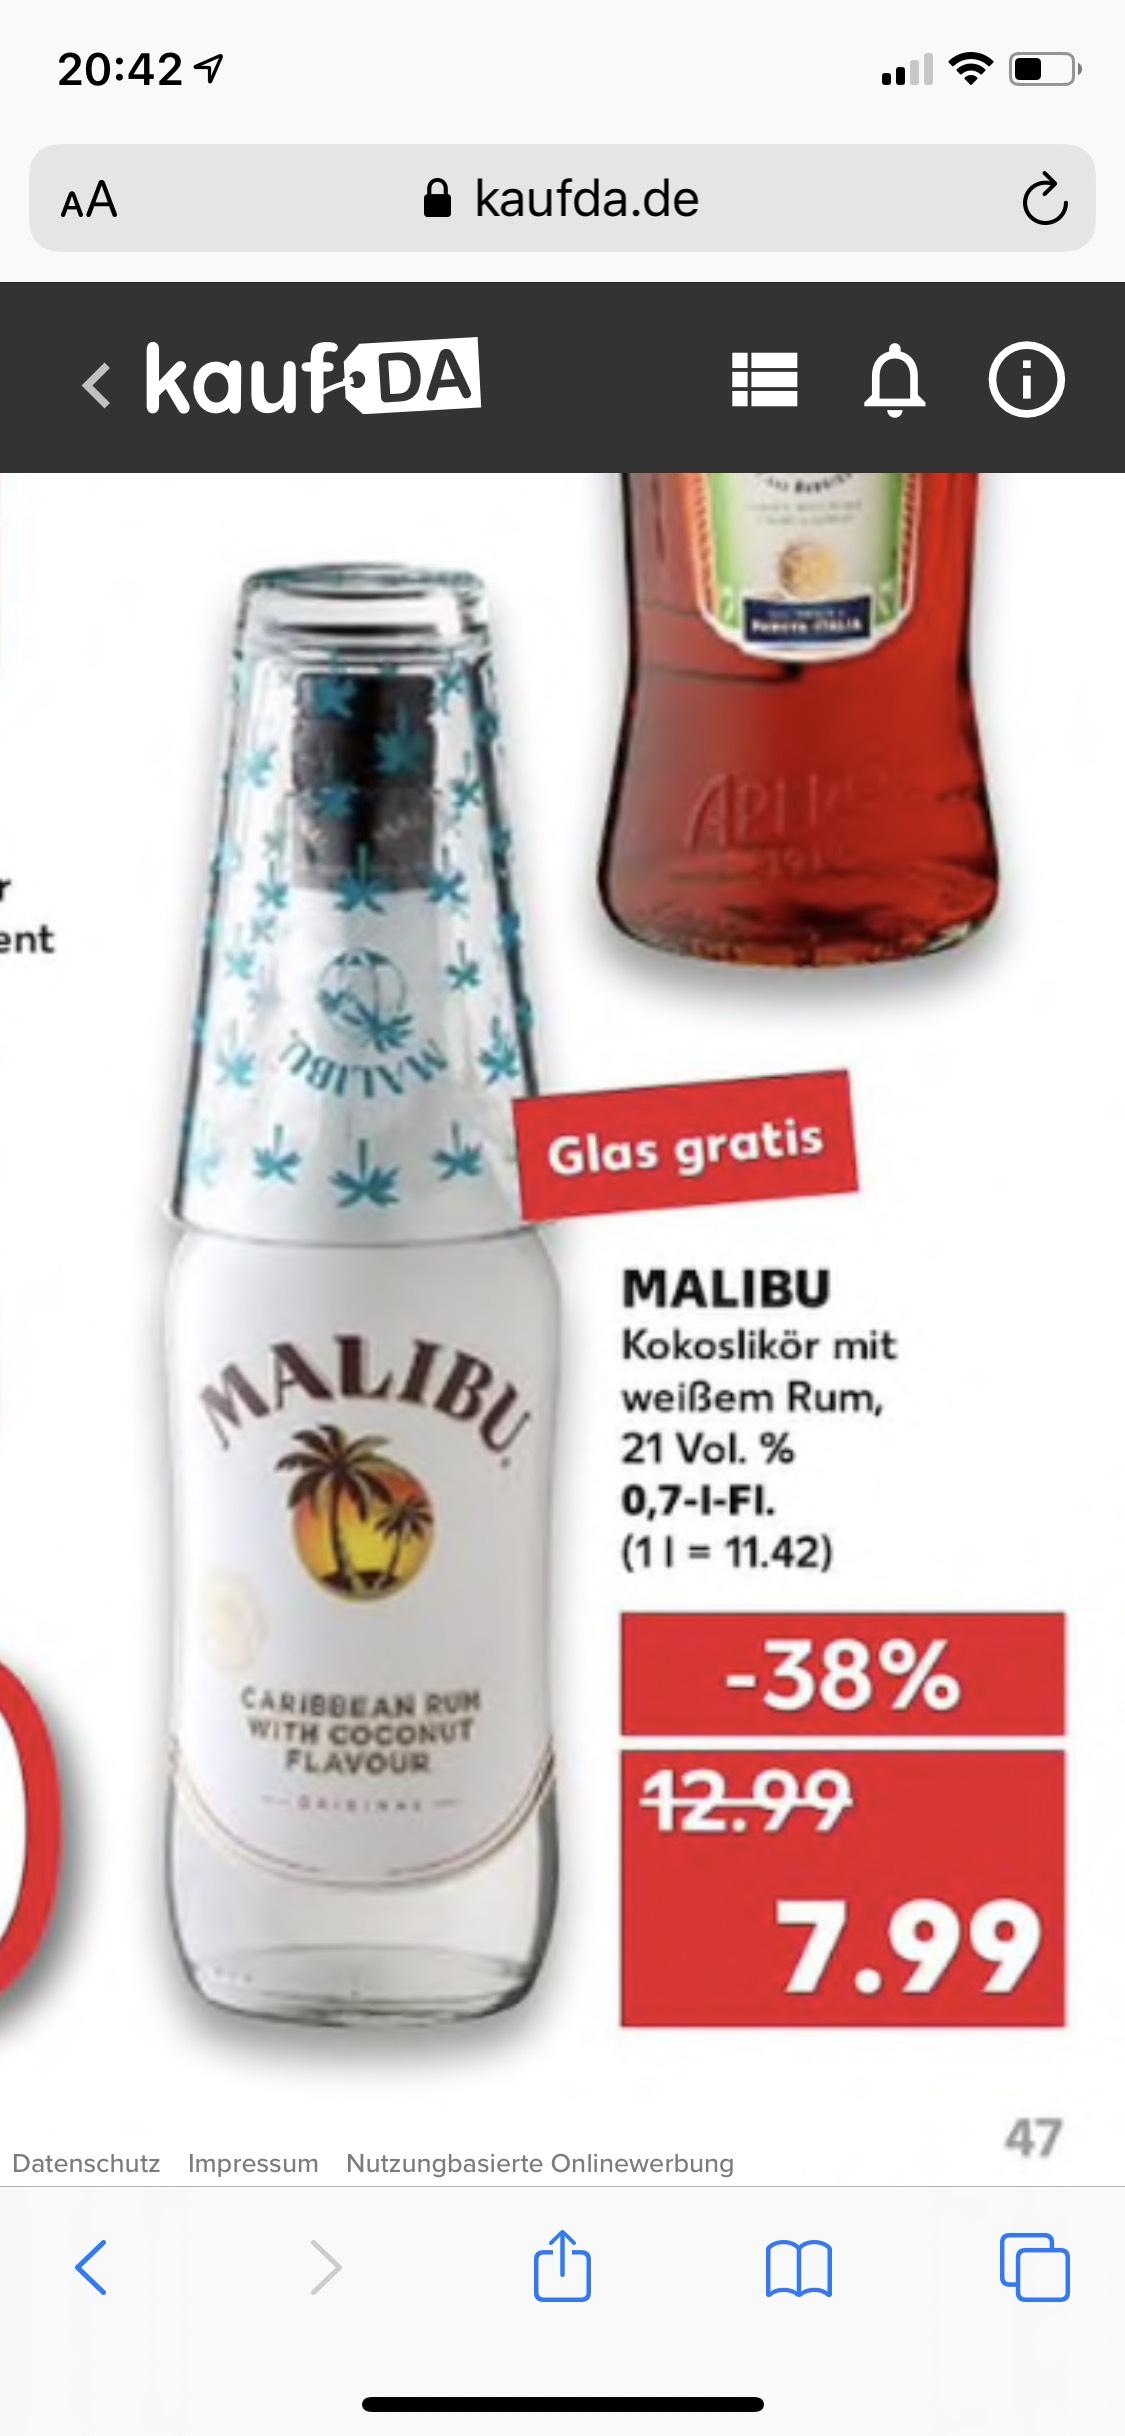 Malibu [Lokal] bei Kaufland